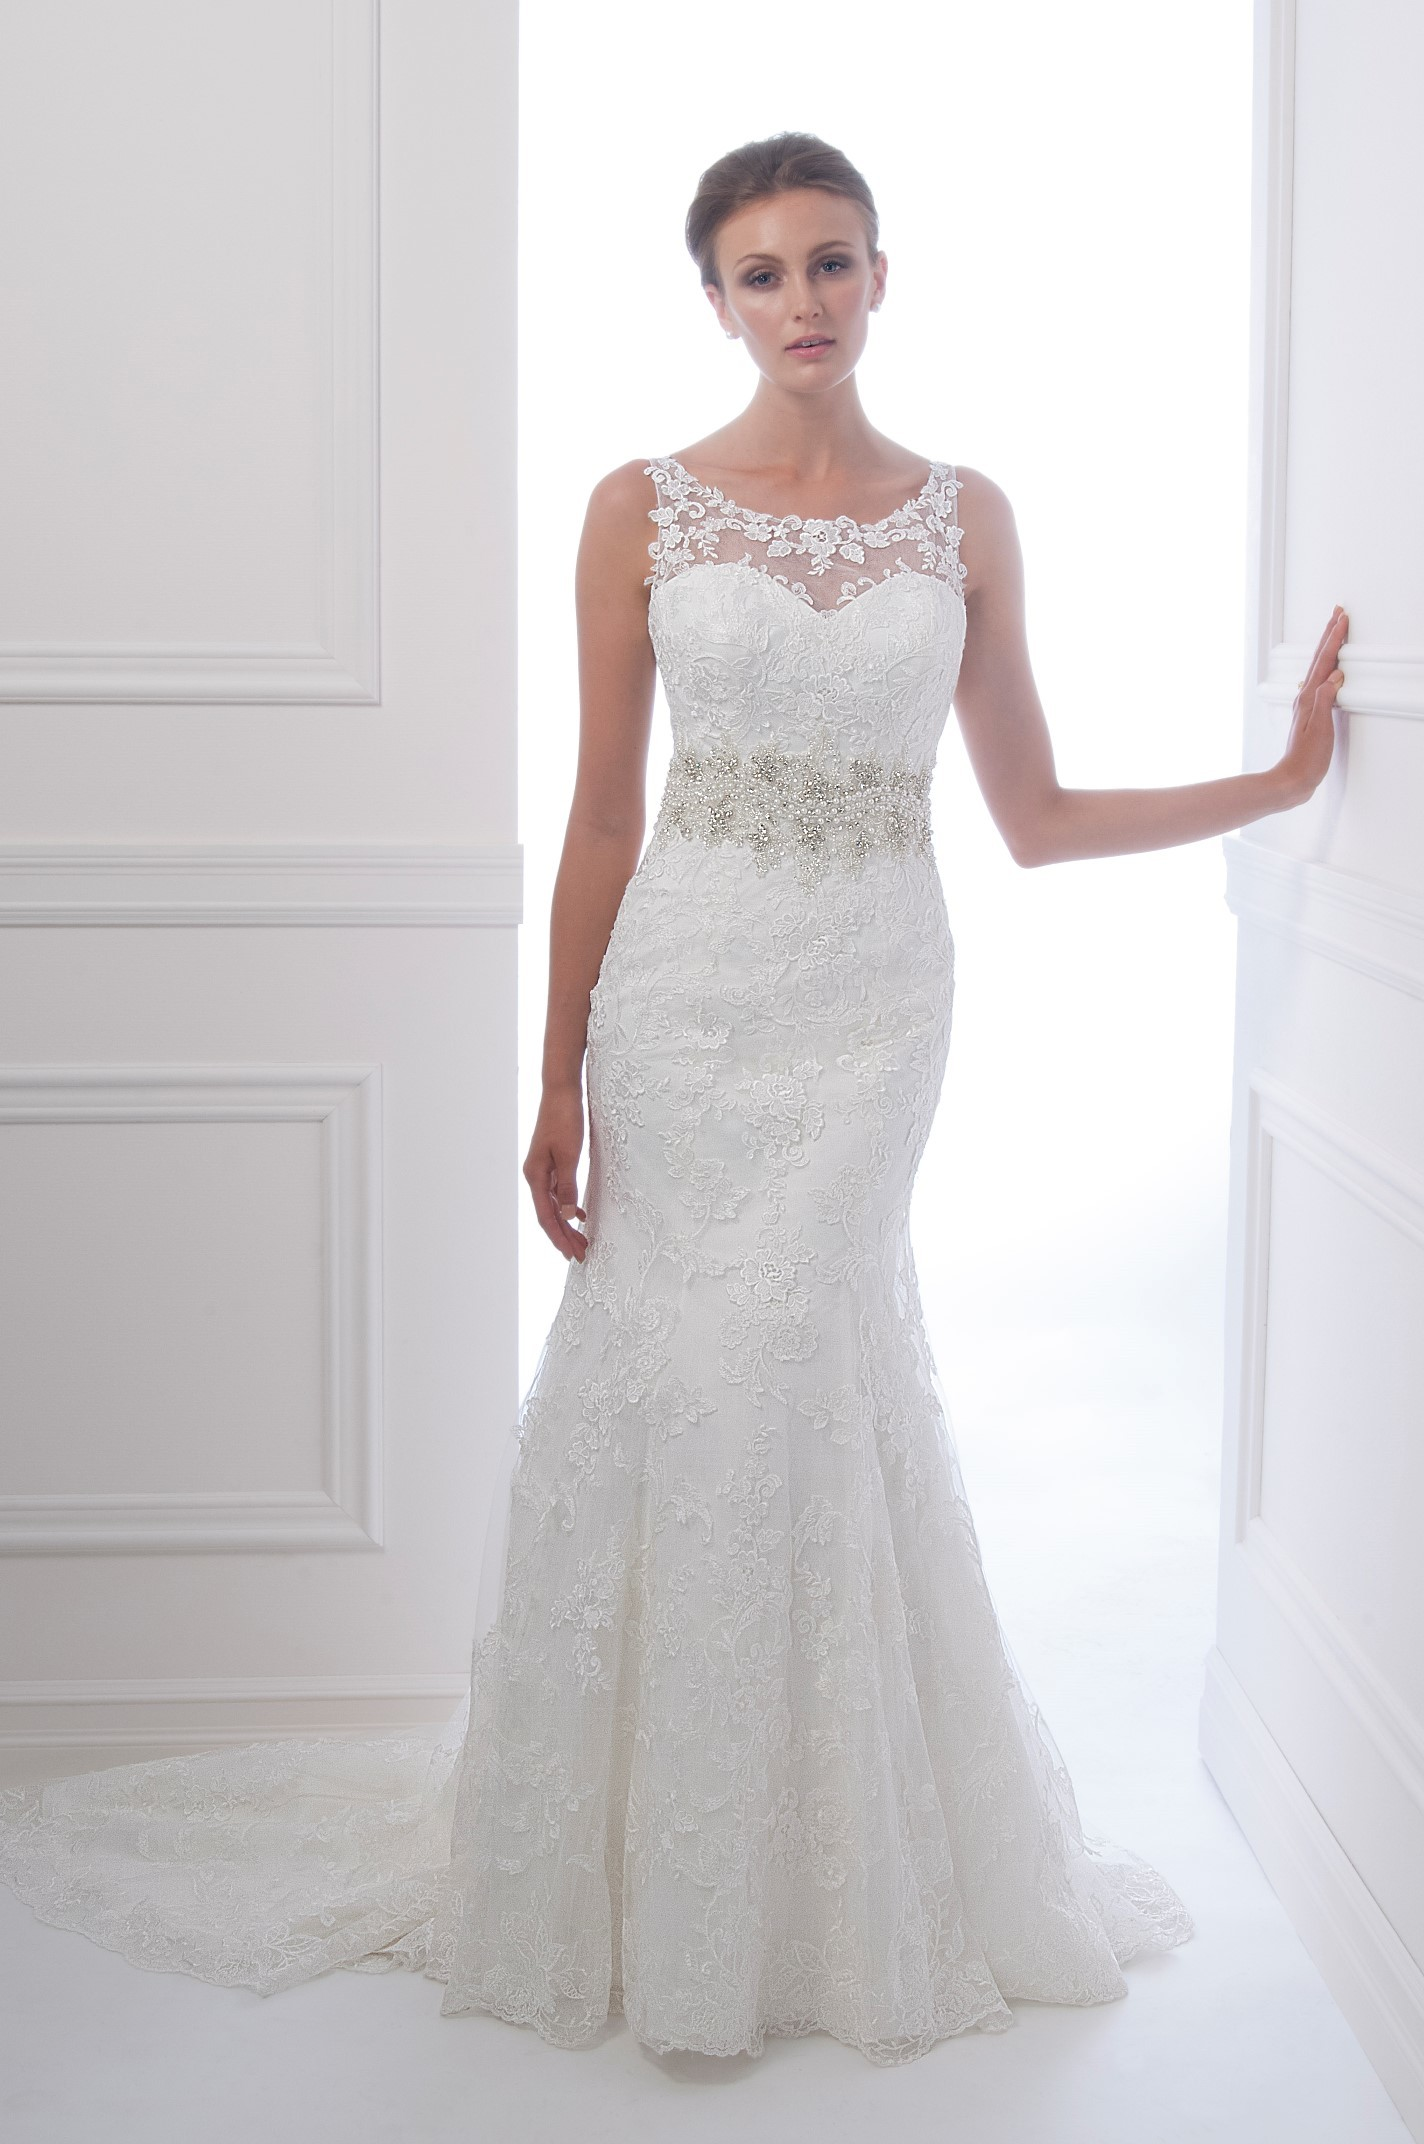 Dress alfred sung spring 2014 bridal 6936 alfredsung bridal alfred sung spring 2014 bridal 6936 ombrellifo Choice Image